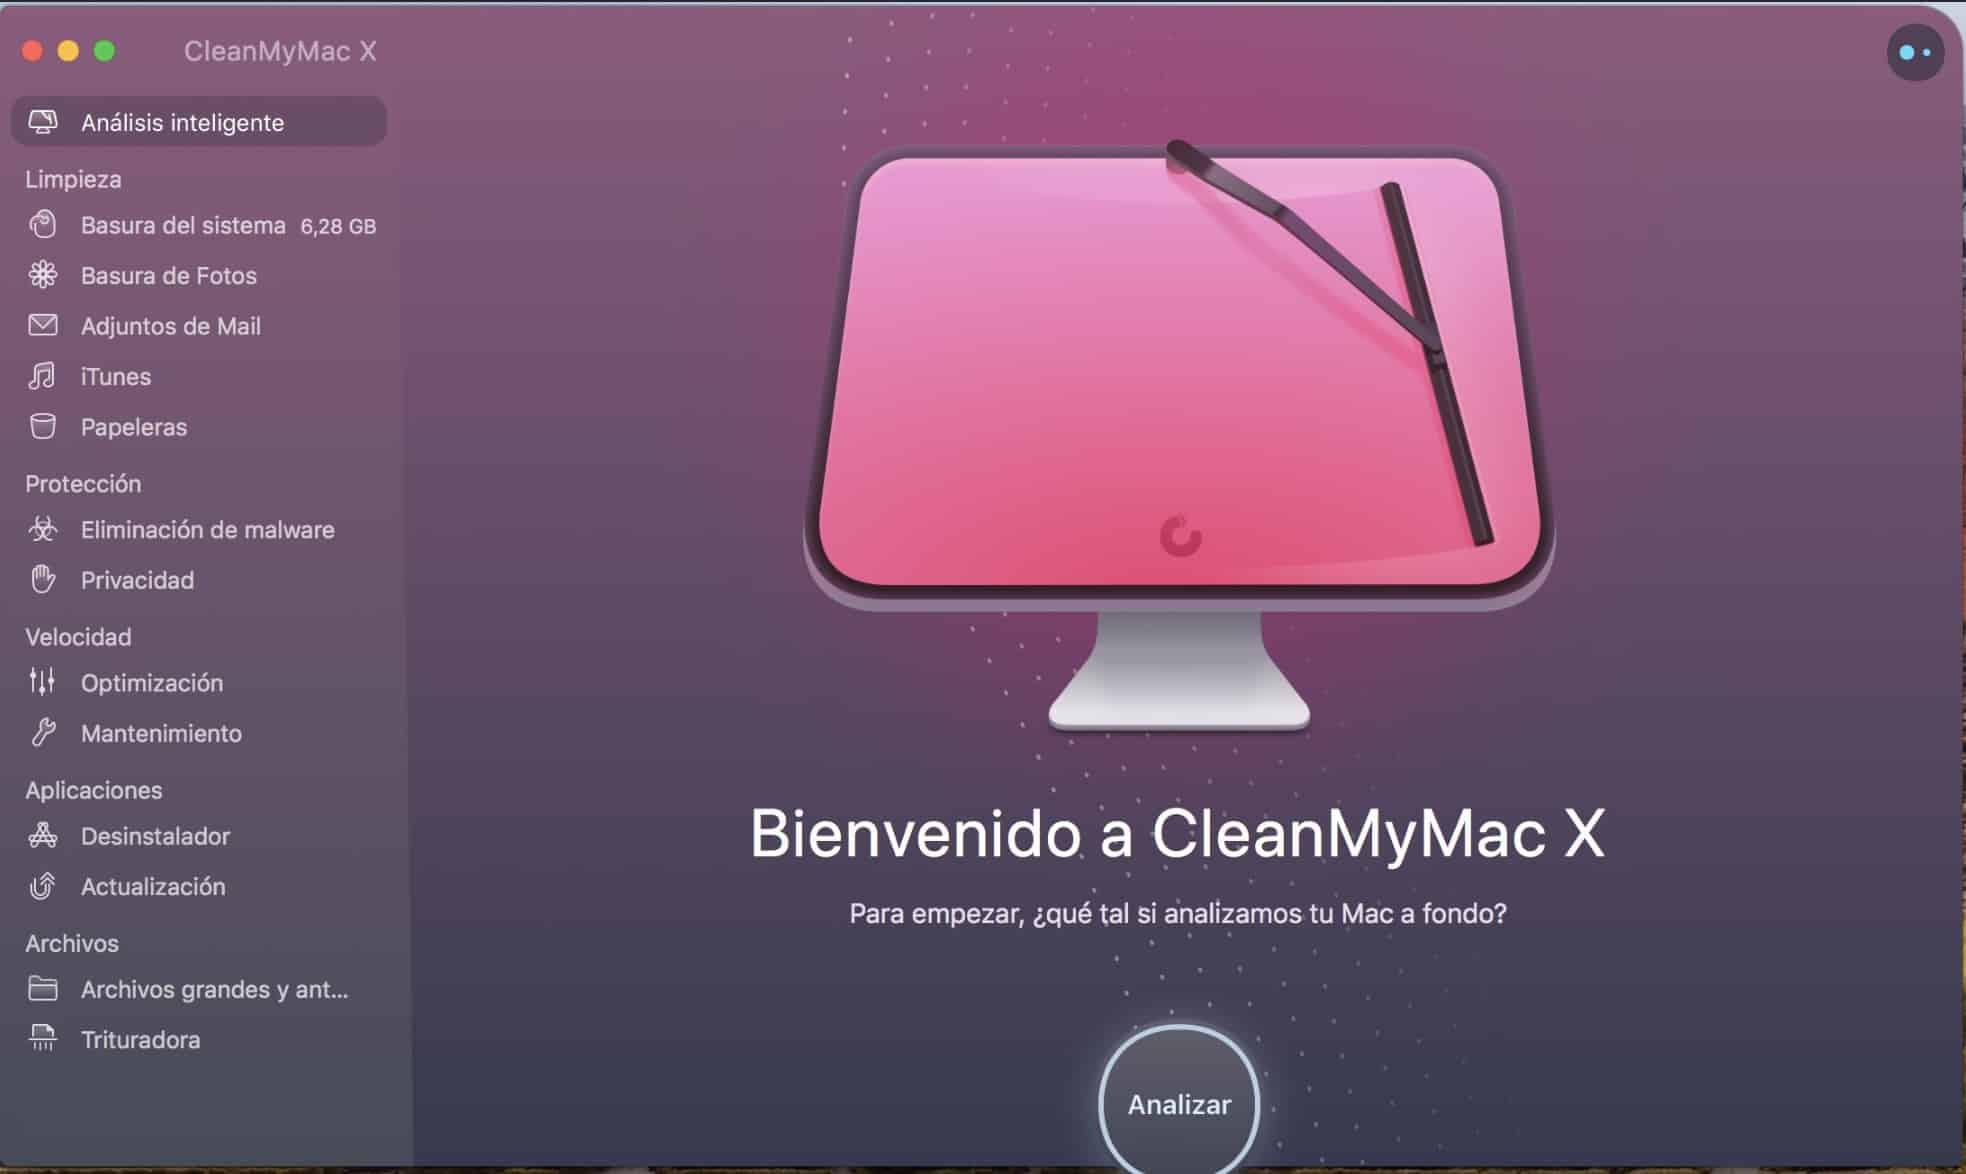 Diseño CleanMyMac X